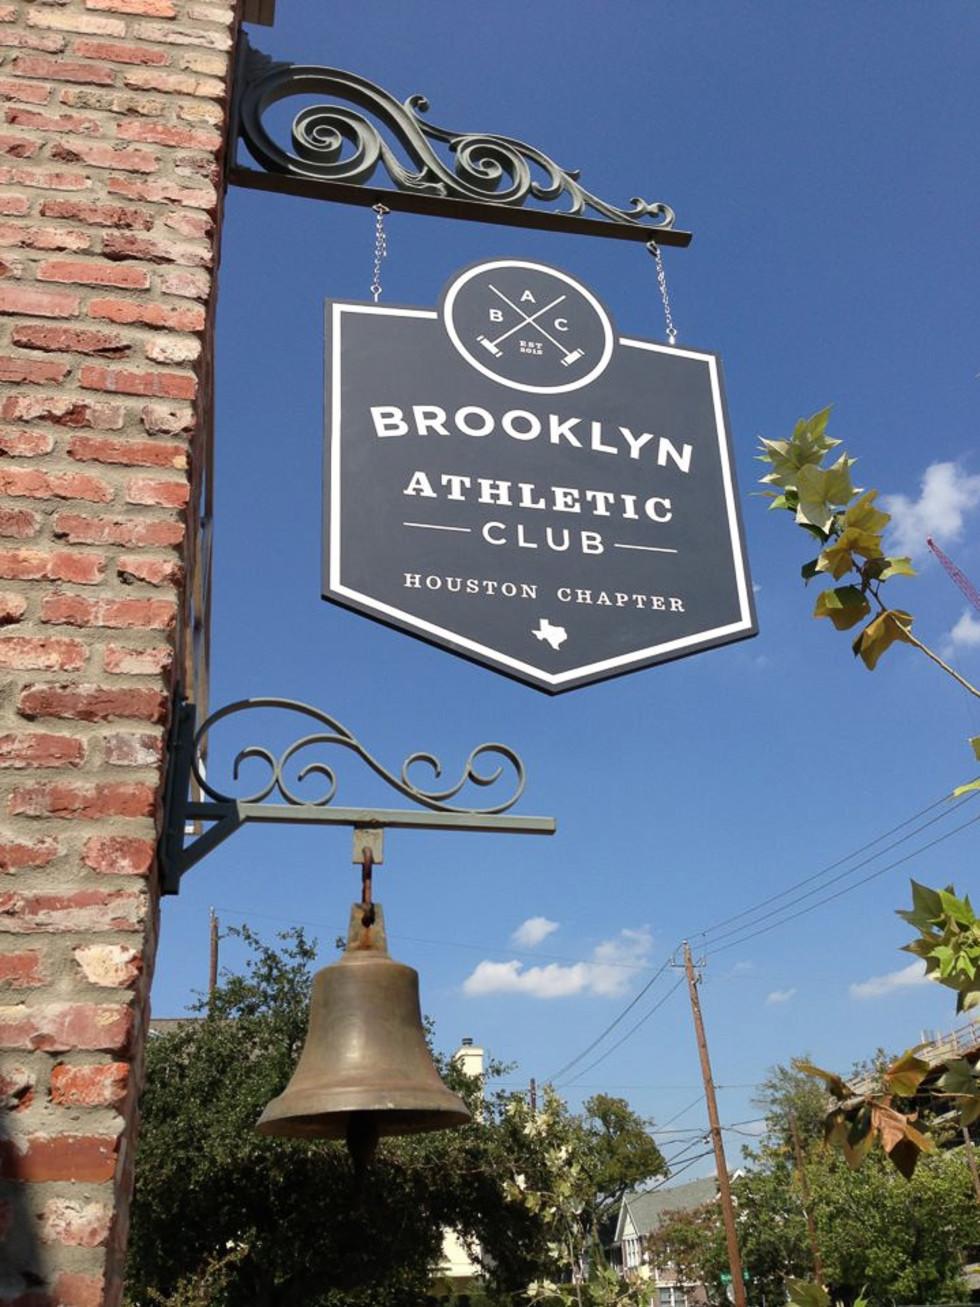 Brooklyn Athletic Club, Houston Chapter, sign